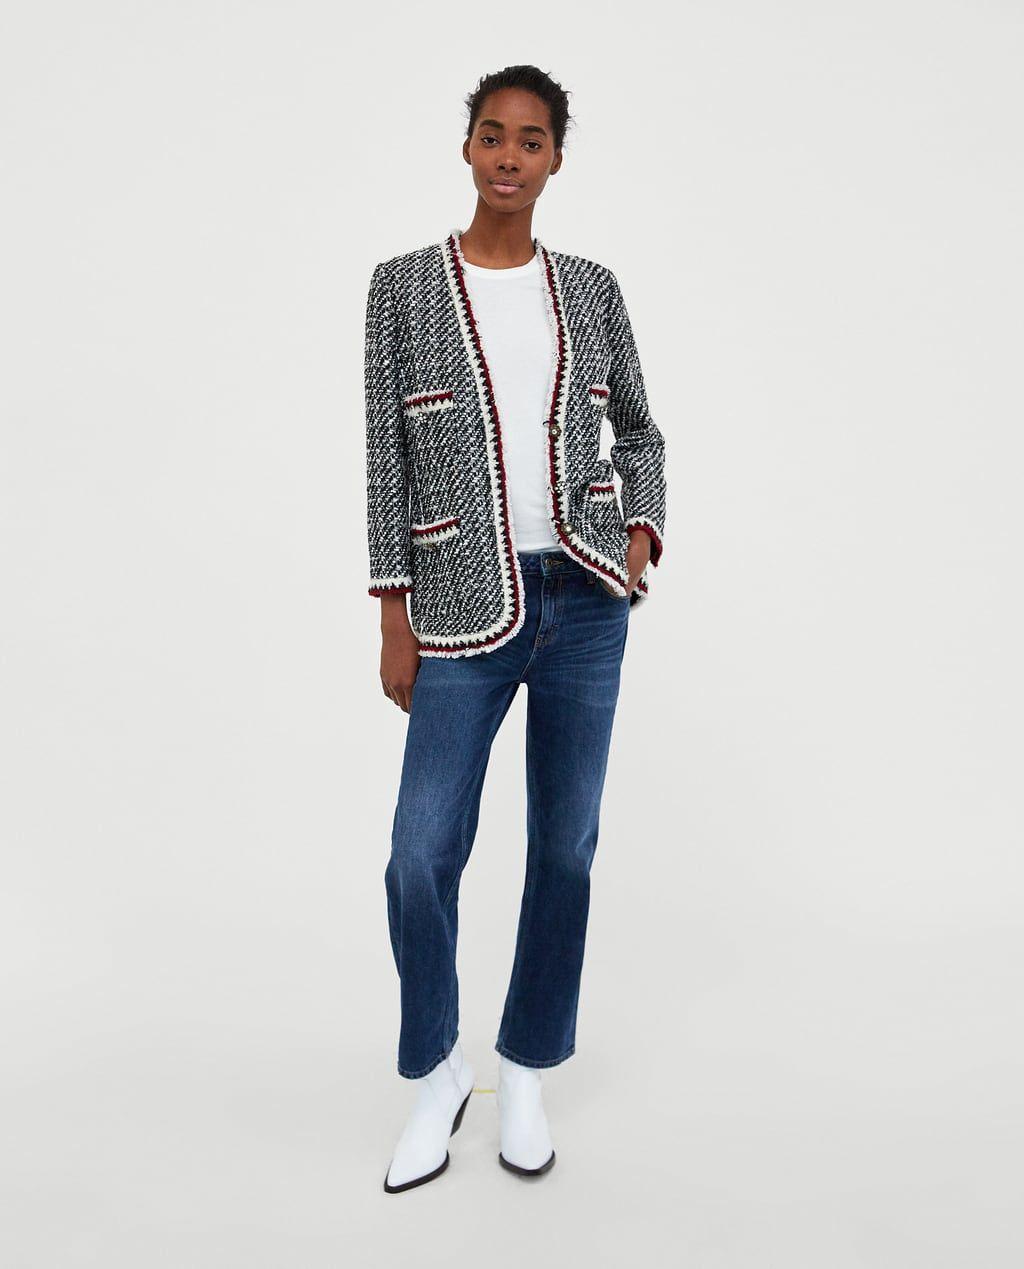 CHAQUETA TWEED | Fashion | Pinterest | Tweed, Chaquetas y Zara